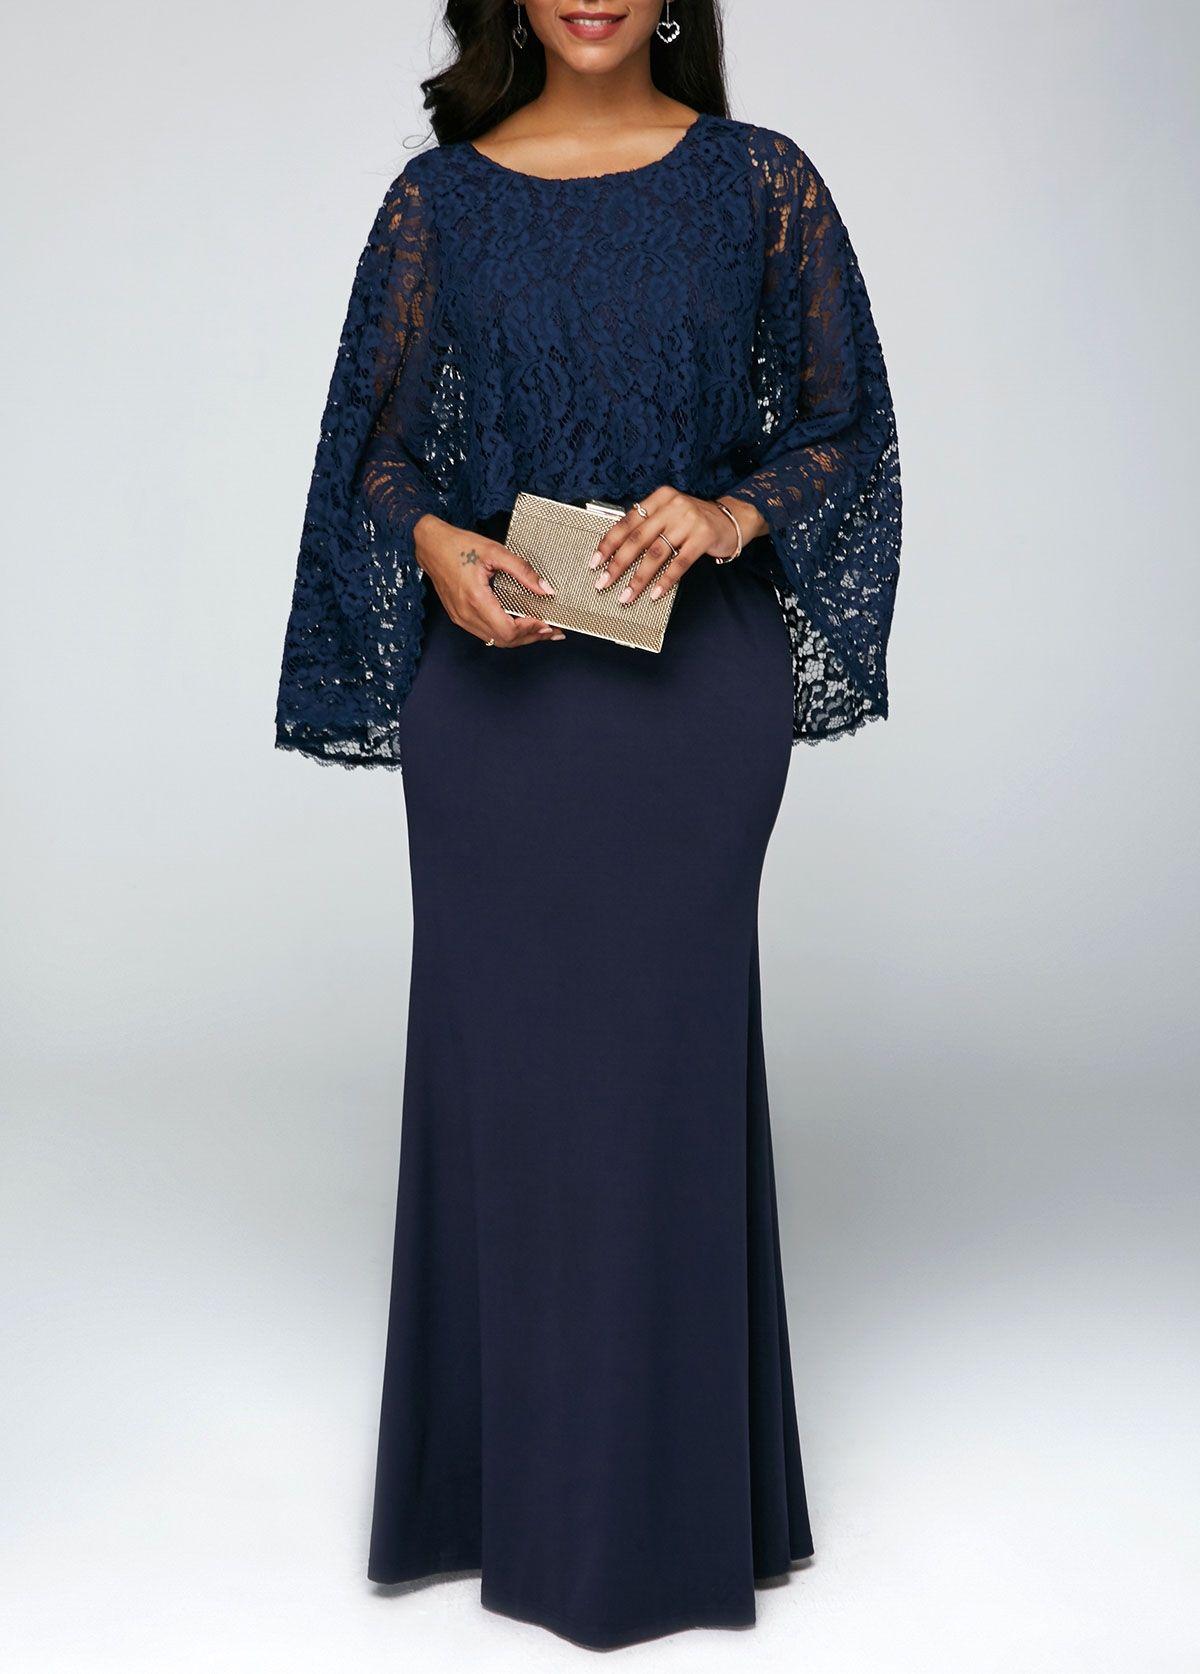 6d57d505d2 Women's Clothing, Dresses, Casual, Batwing Oversized Loose Plain Summer  Sleeveless Pocket Long Maxi Dress - Black - CY12F1J…